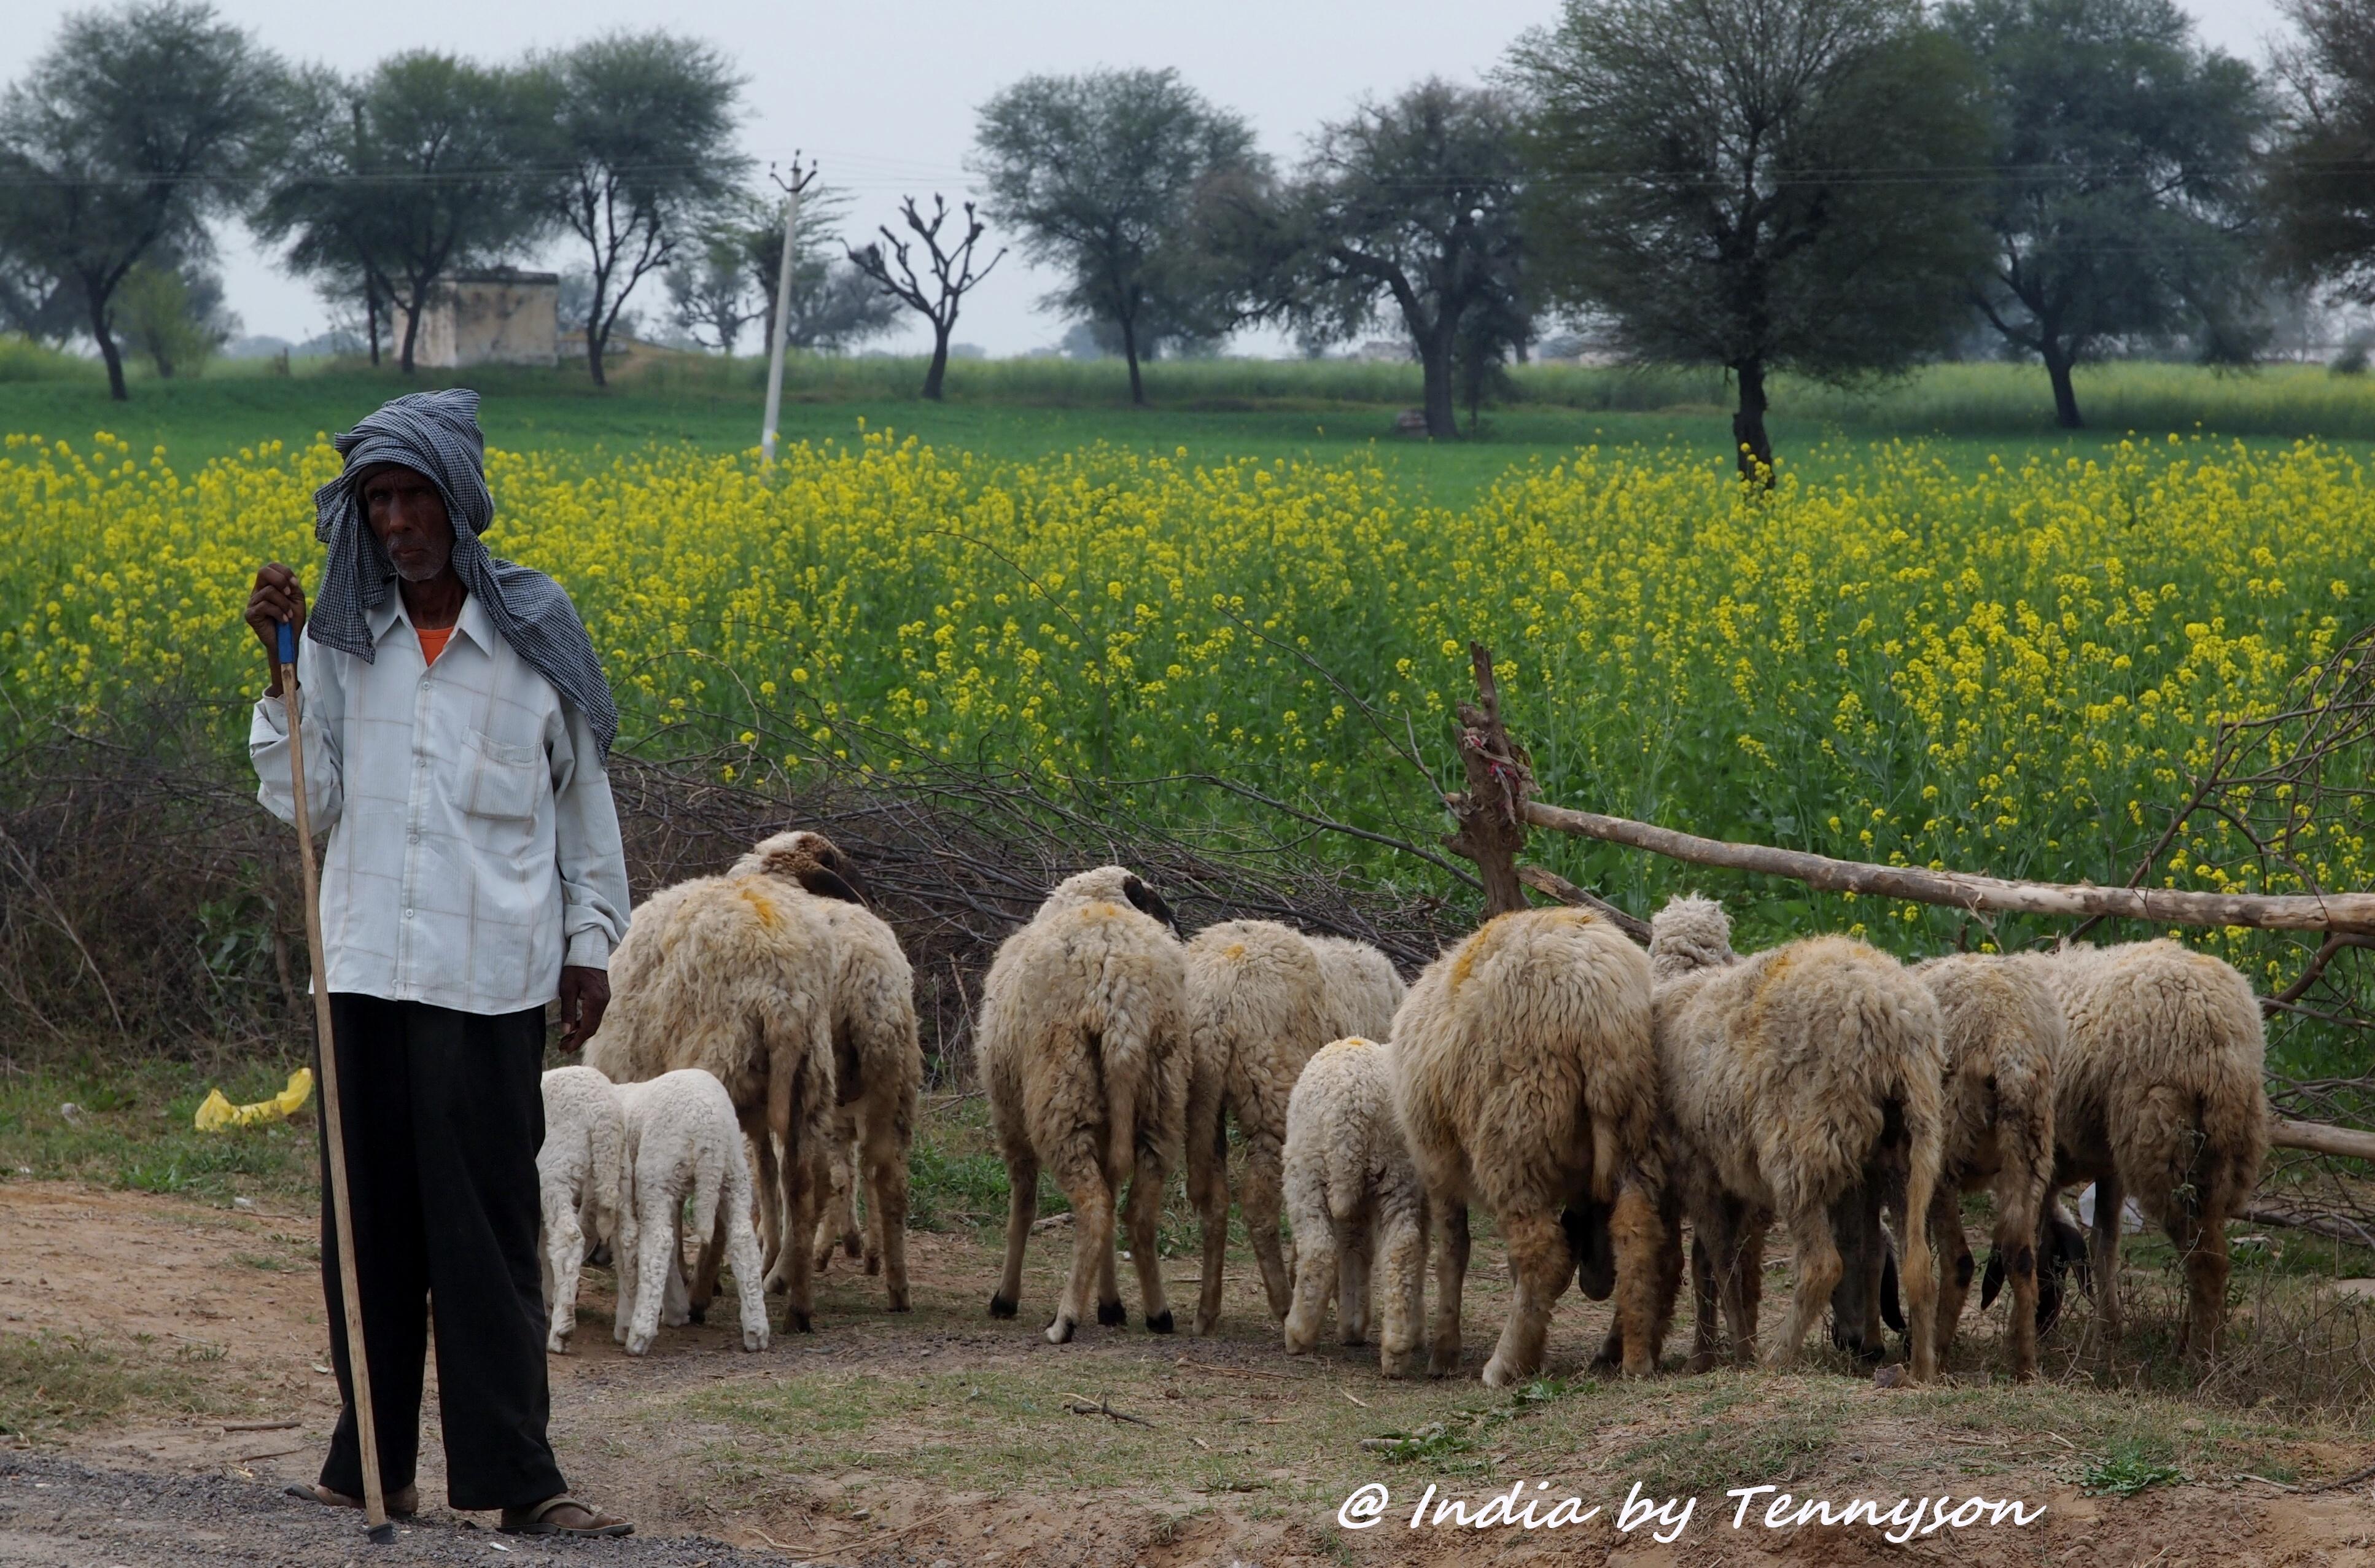 Impressions of India – Animal Bond | Present Moment